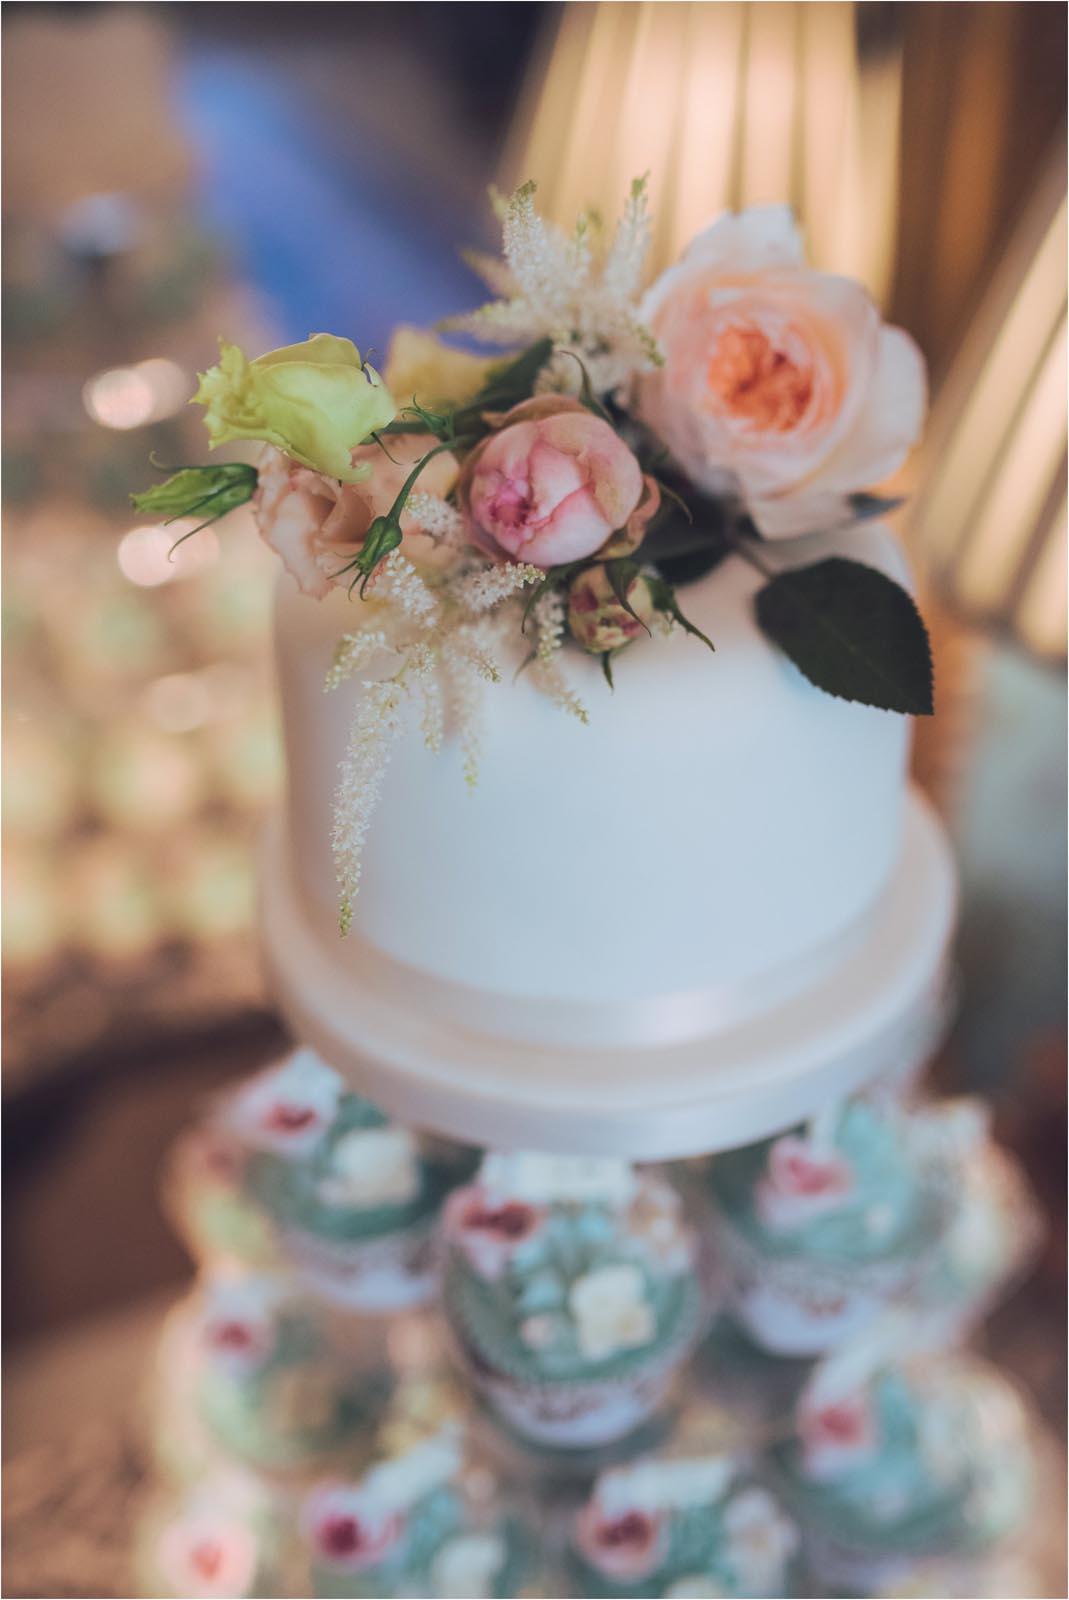 Simon biffen wedding photography 0097